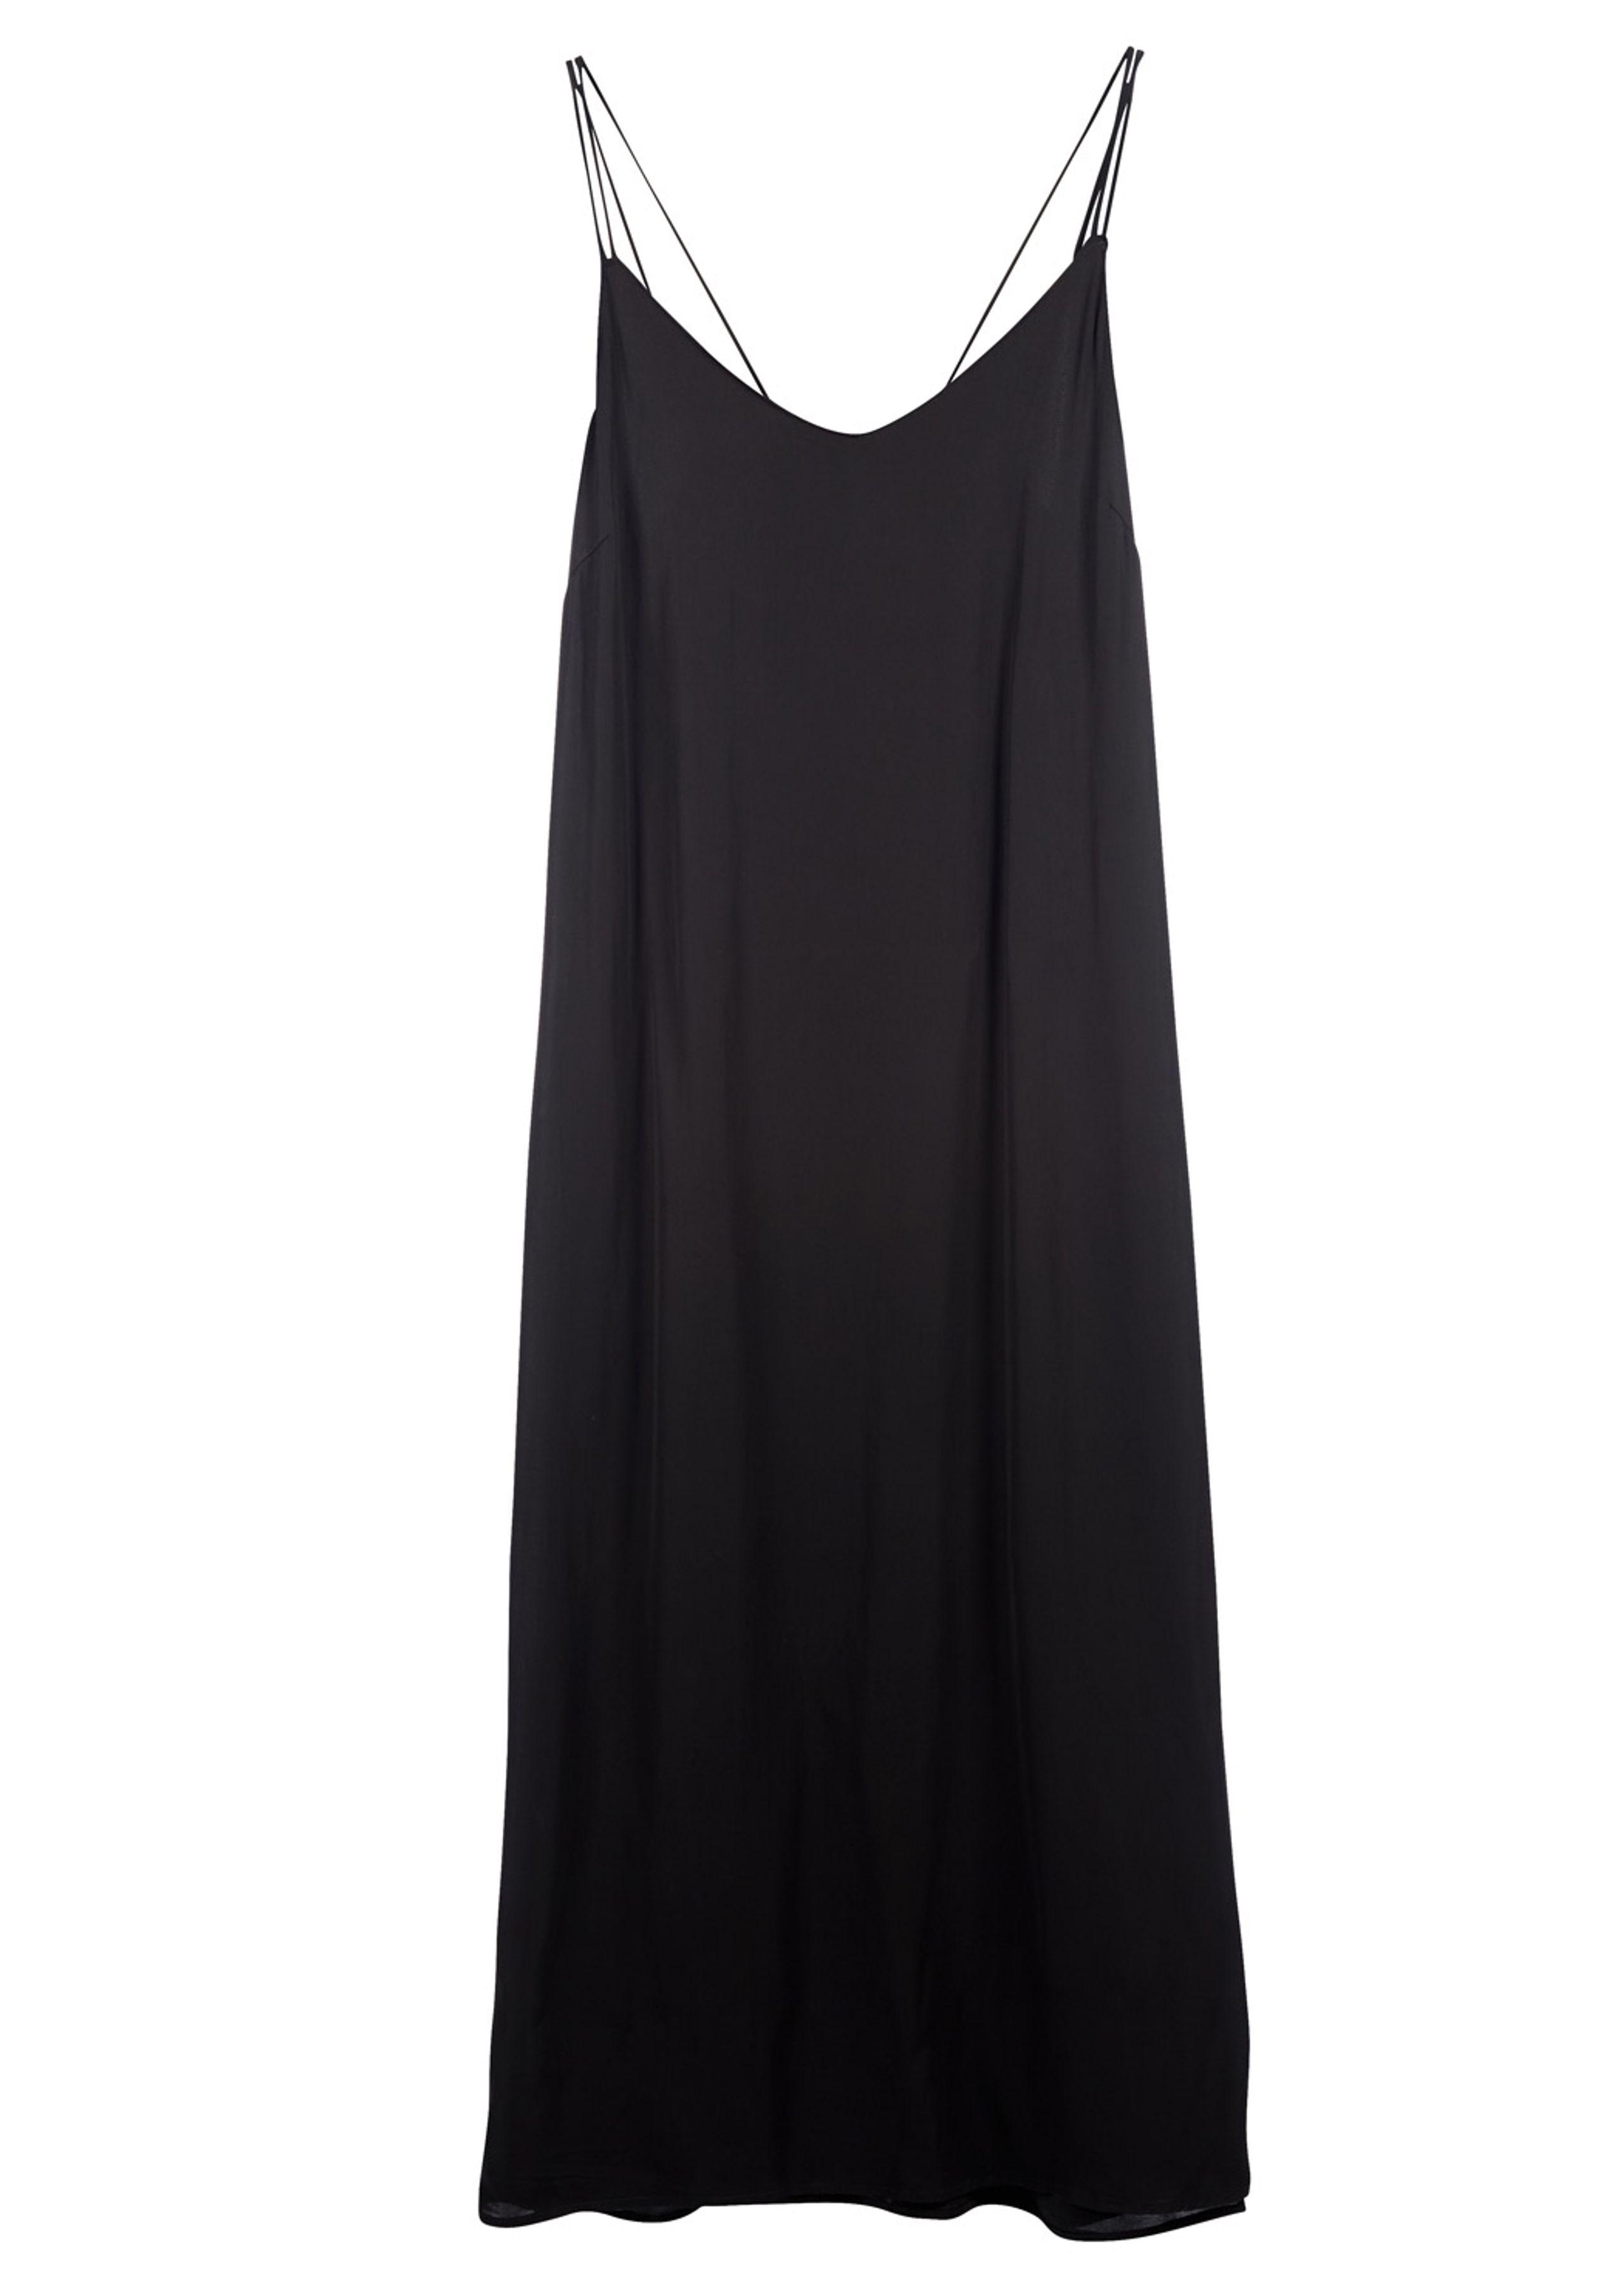 Image of   Tora Strap Dress